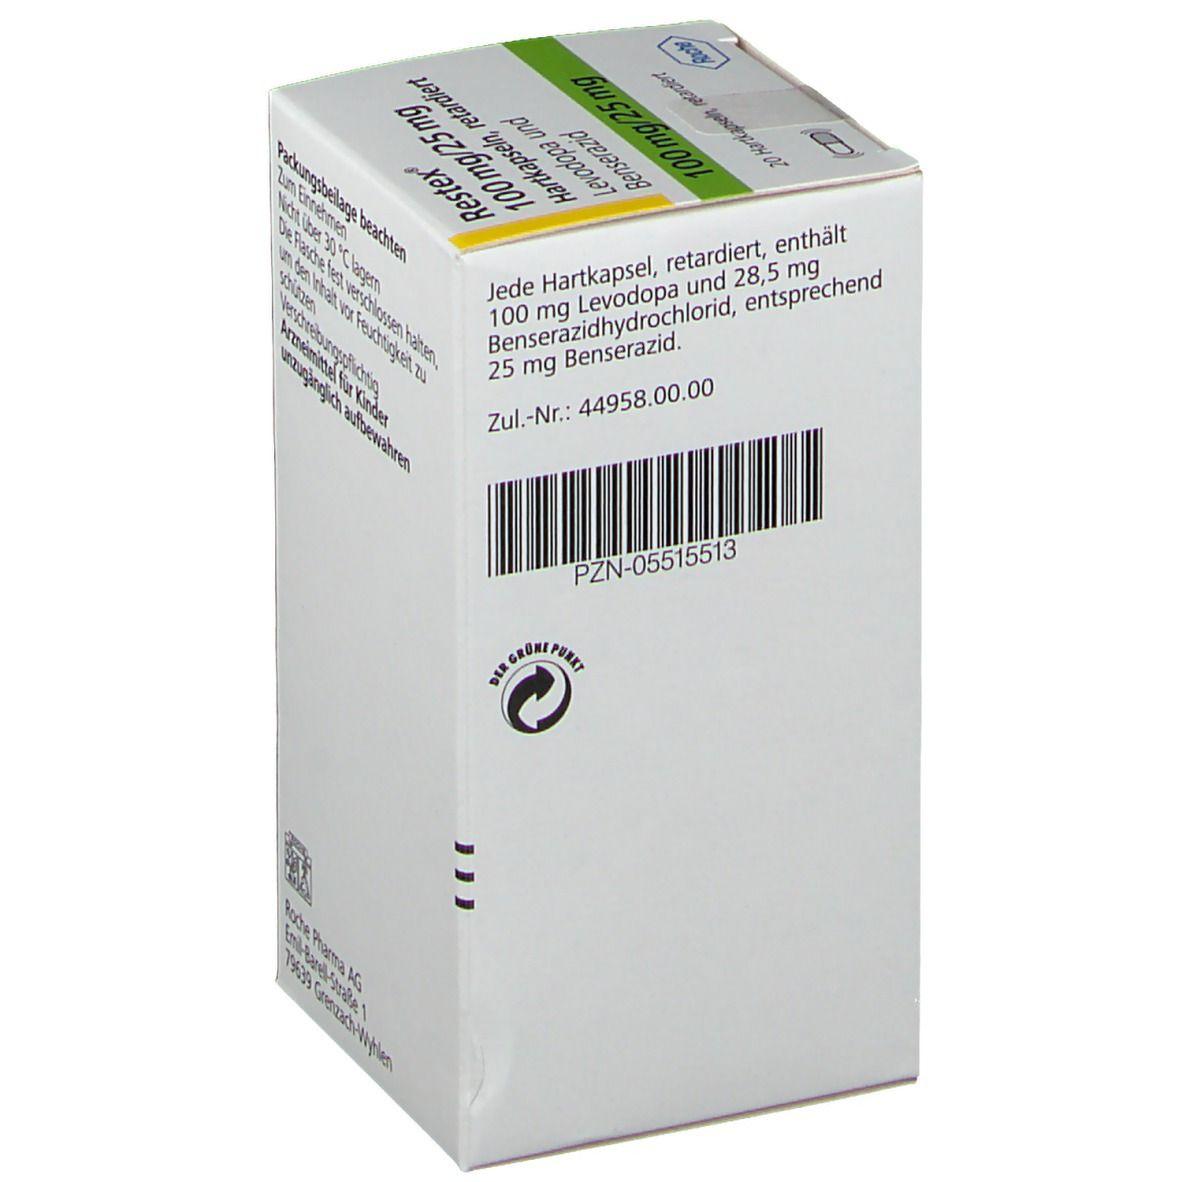 RESTEX 100 mg/25 mg Hartkapseln retardiert